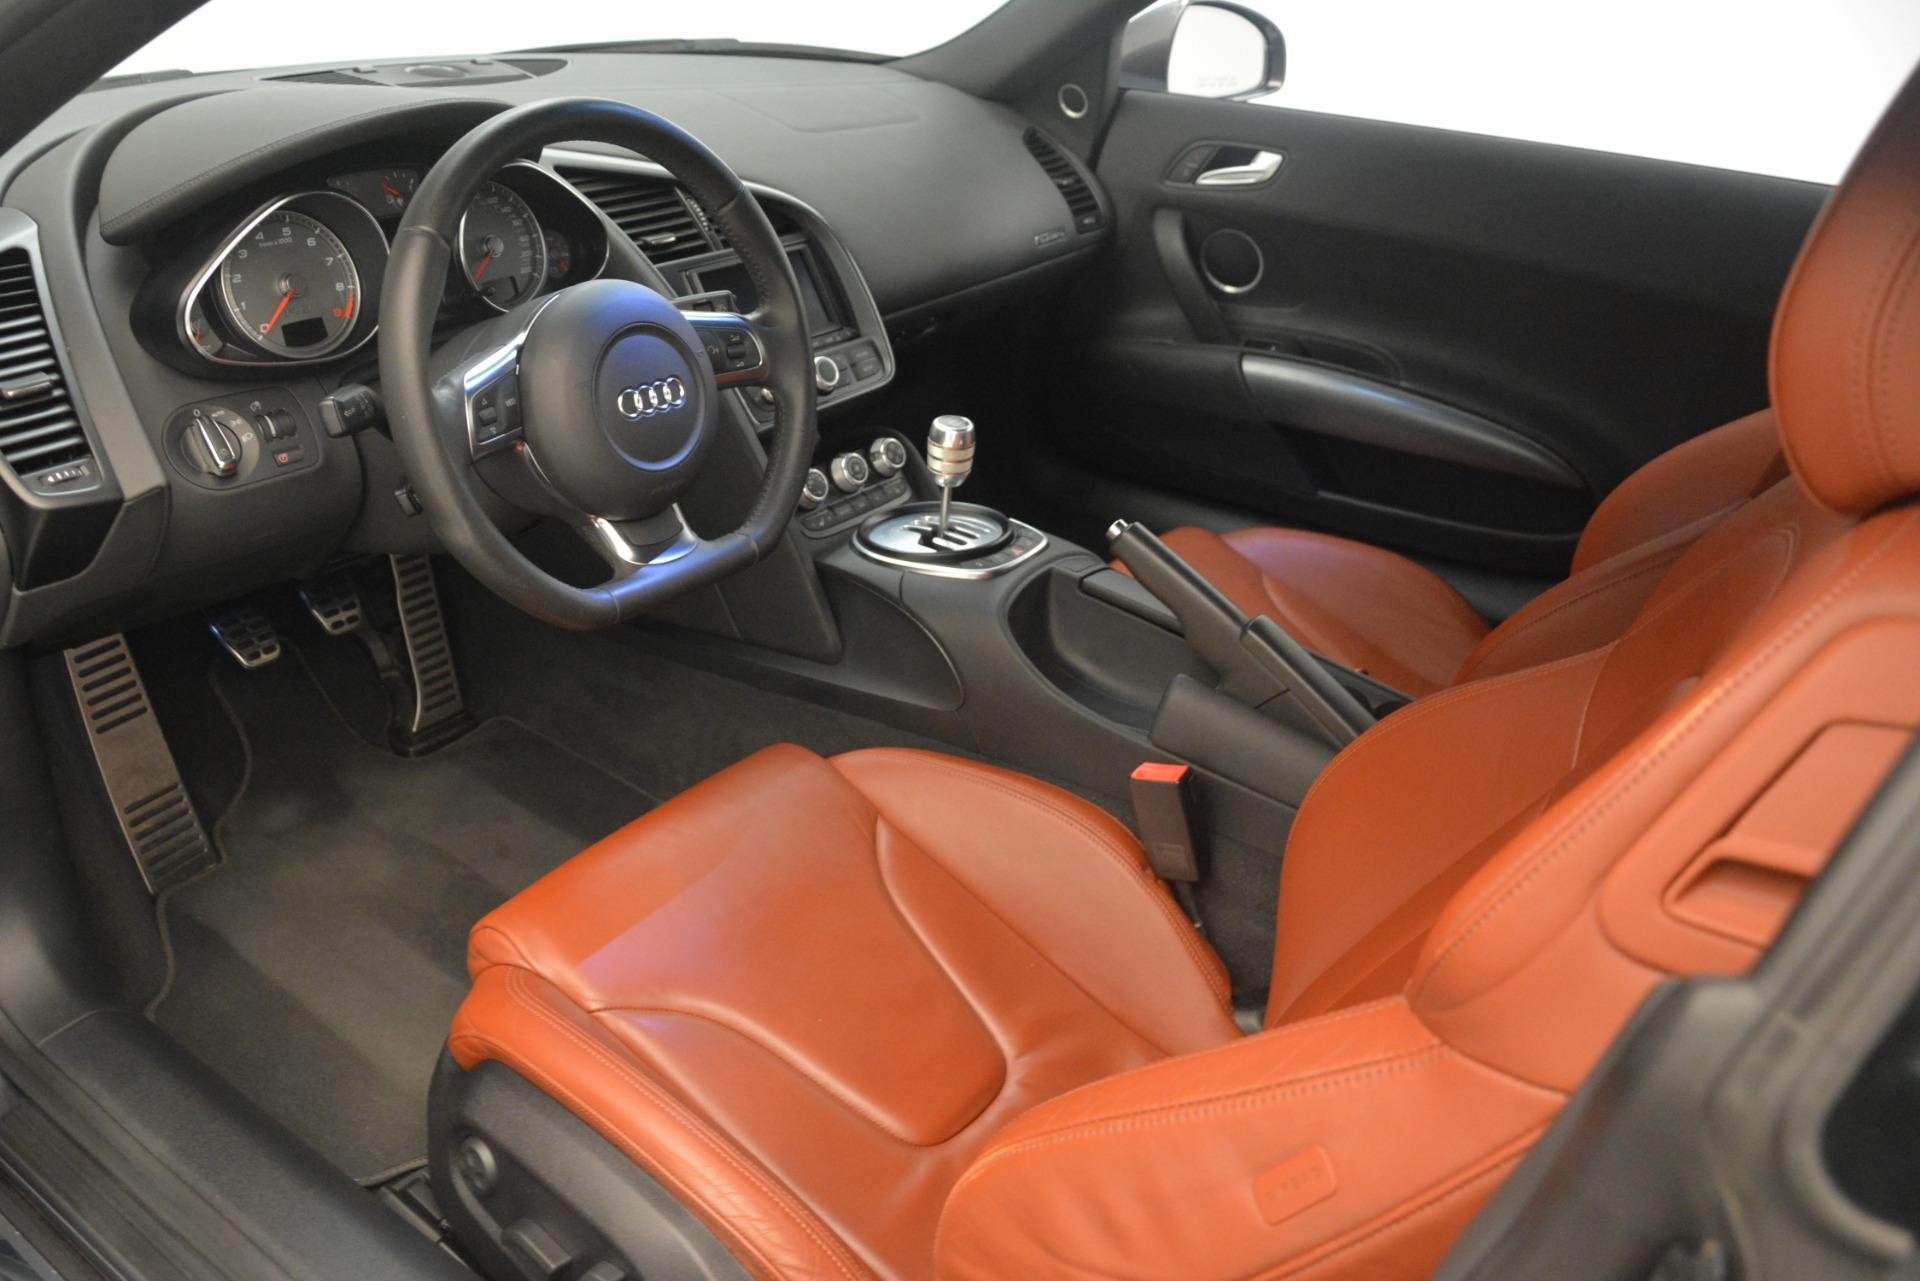 Used 2009 Audi R8 quattro For Sale In Greenwich, CT 3228_p13